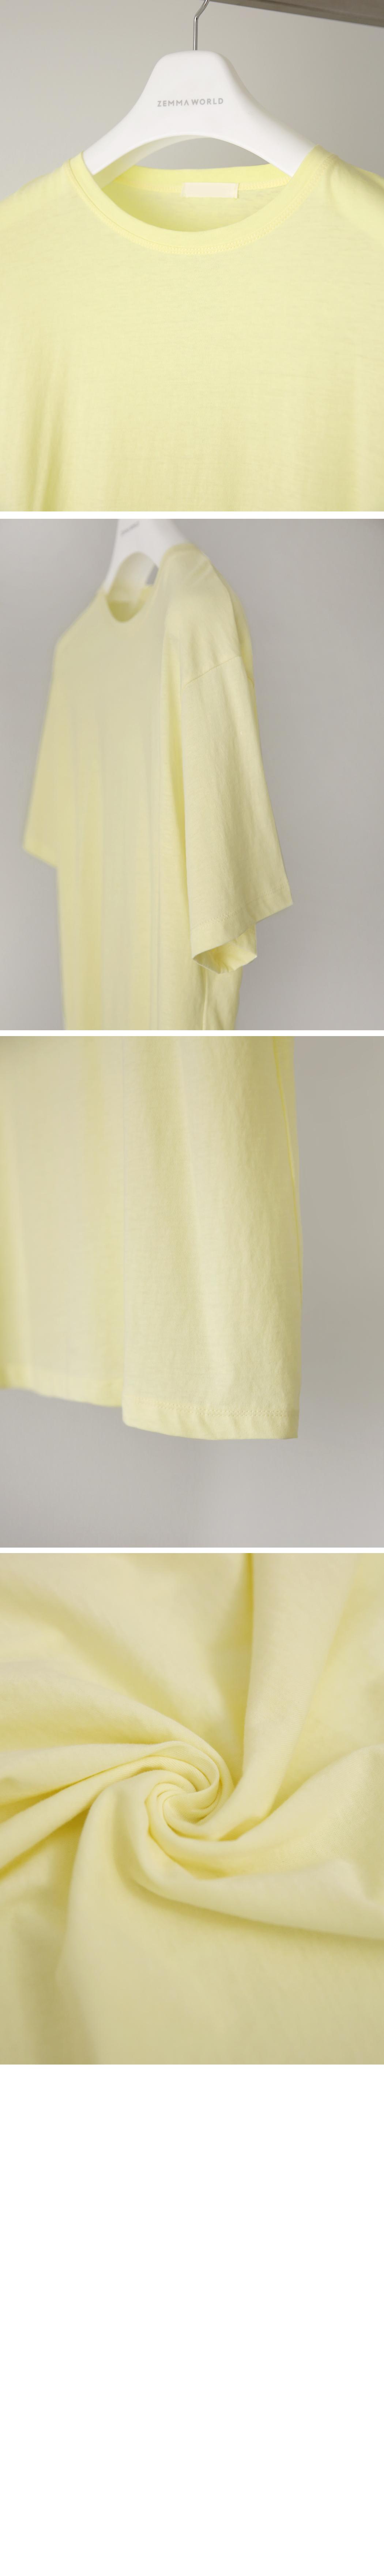 Lemon Balm Smooth Cotton Short Sleeve Tee